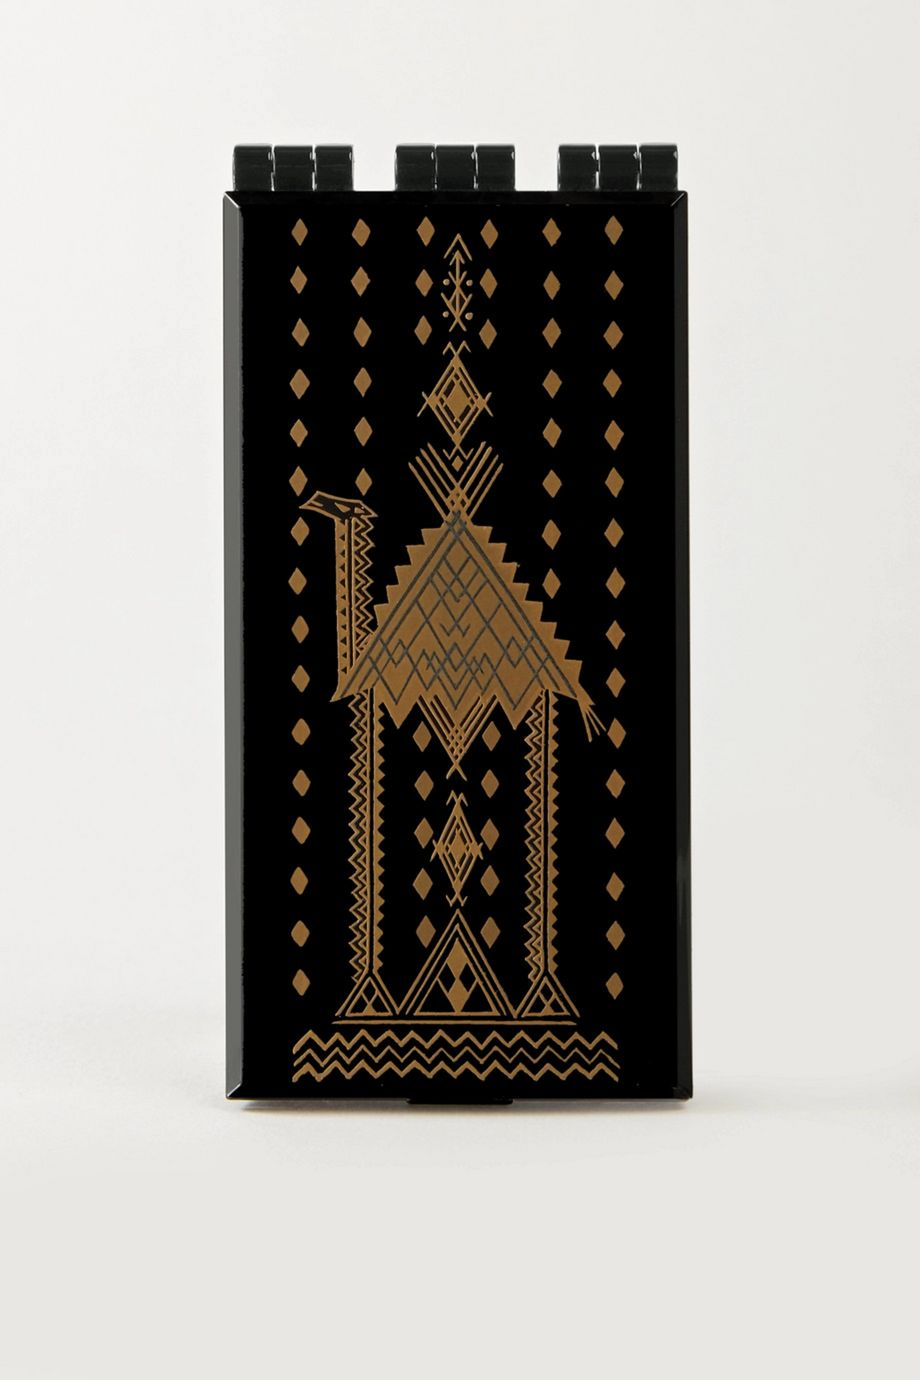 Serge Lutens Lacquered Powder Case – Black/Gold – Puderdose